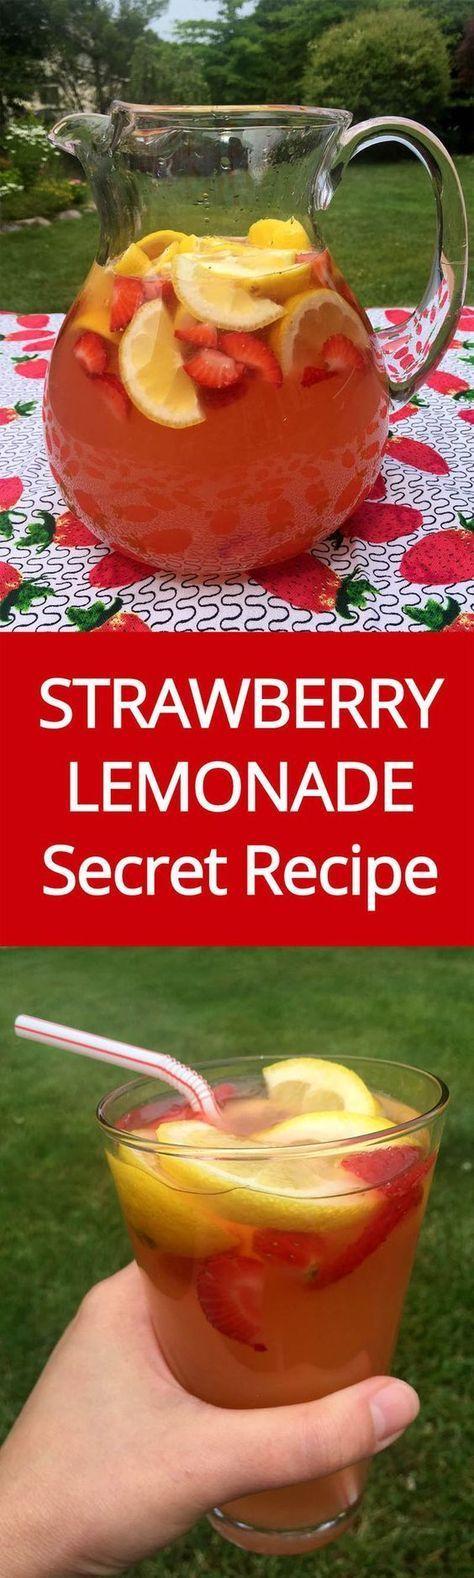 Homemade Strawberry Lemonade Recipe With Freshly Squeezed Lemons And Strawberry Slices   http://MelanieCooks.com